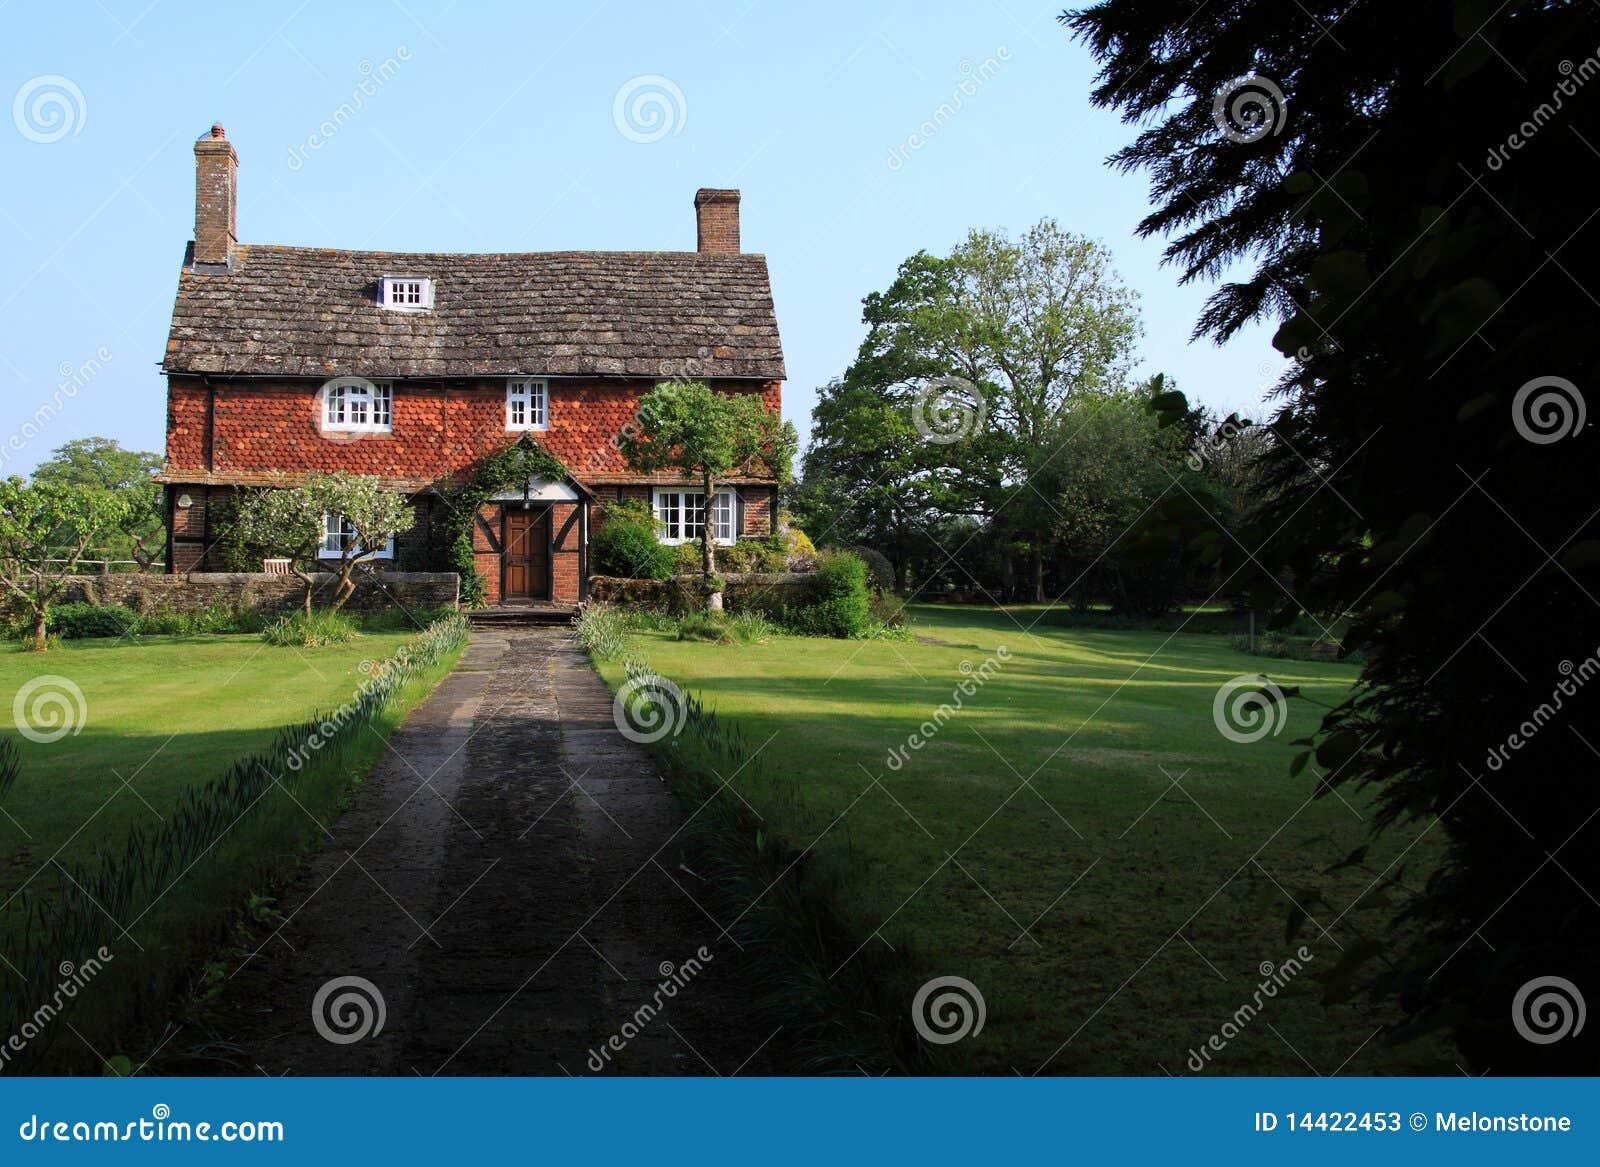 Old Historic English Farmhouse Stock Photos Image 14422453